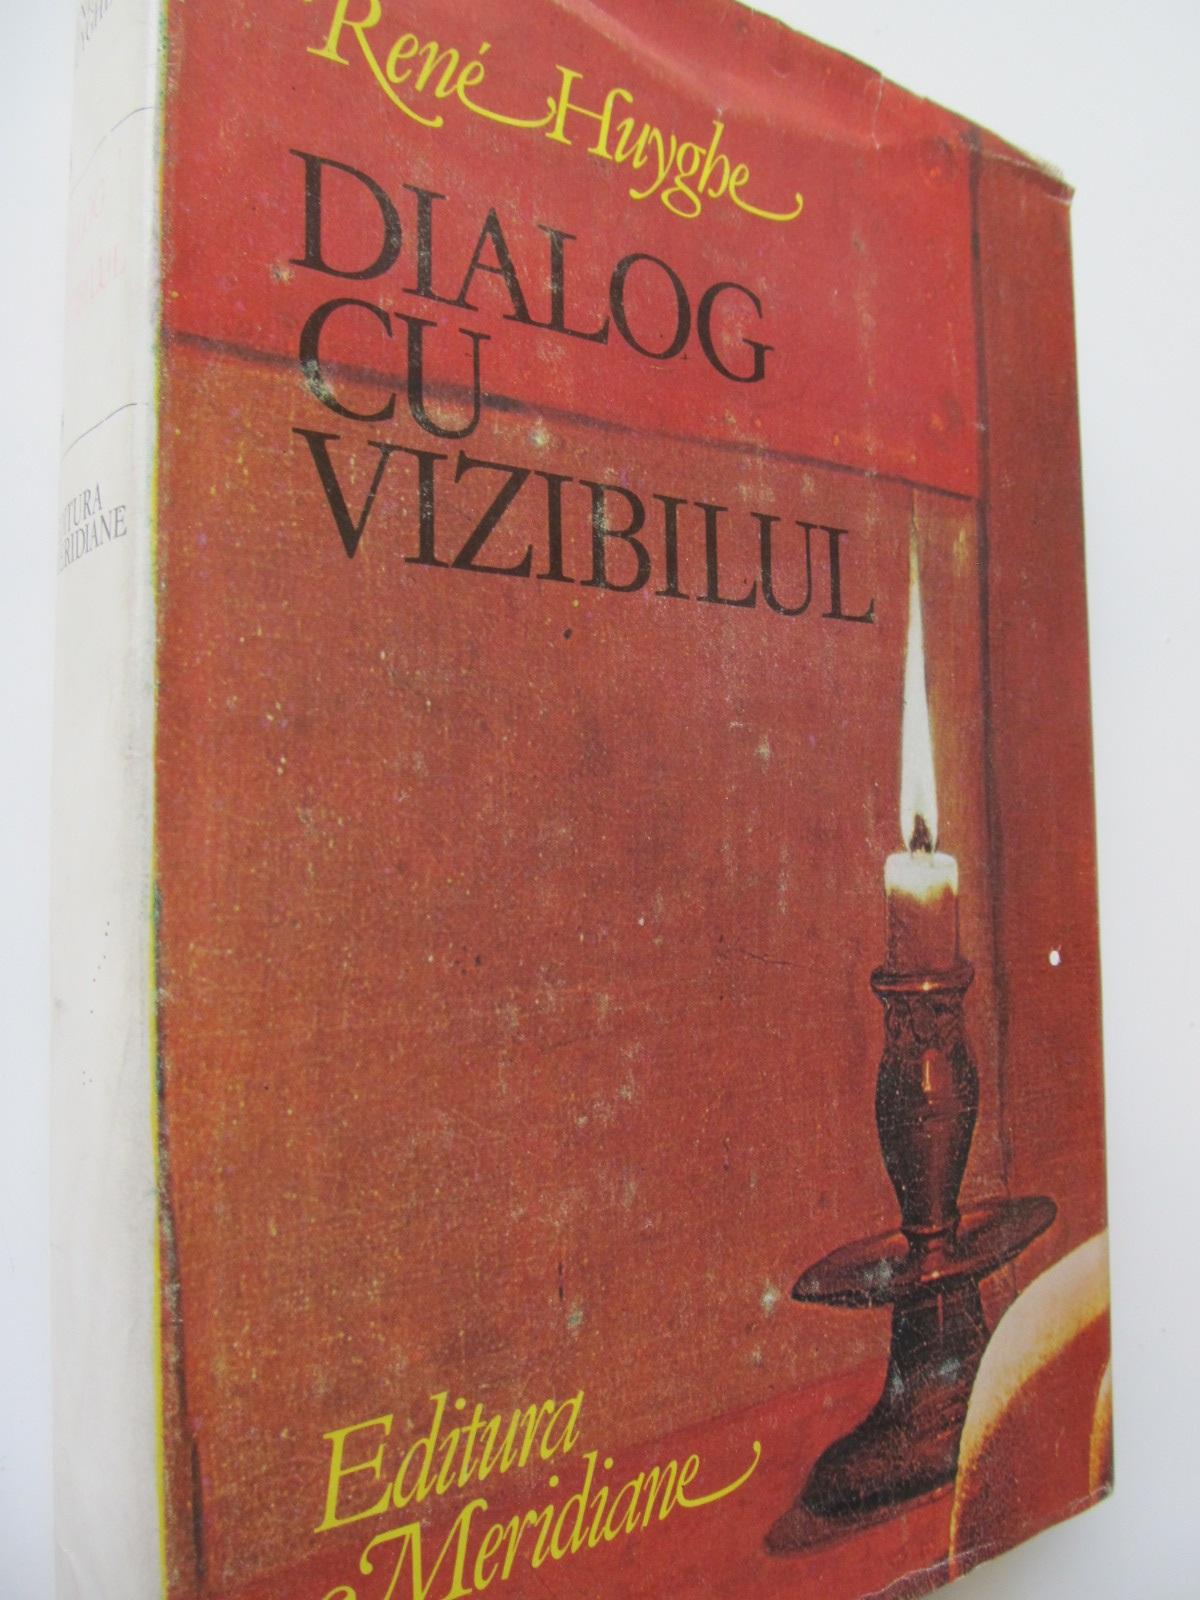 Dialog cu vizibilul - Rene Huyghe | Detalii carte